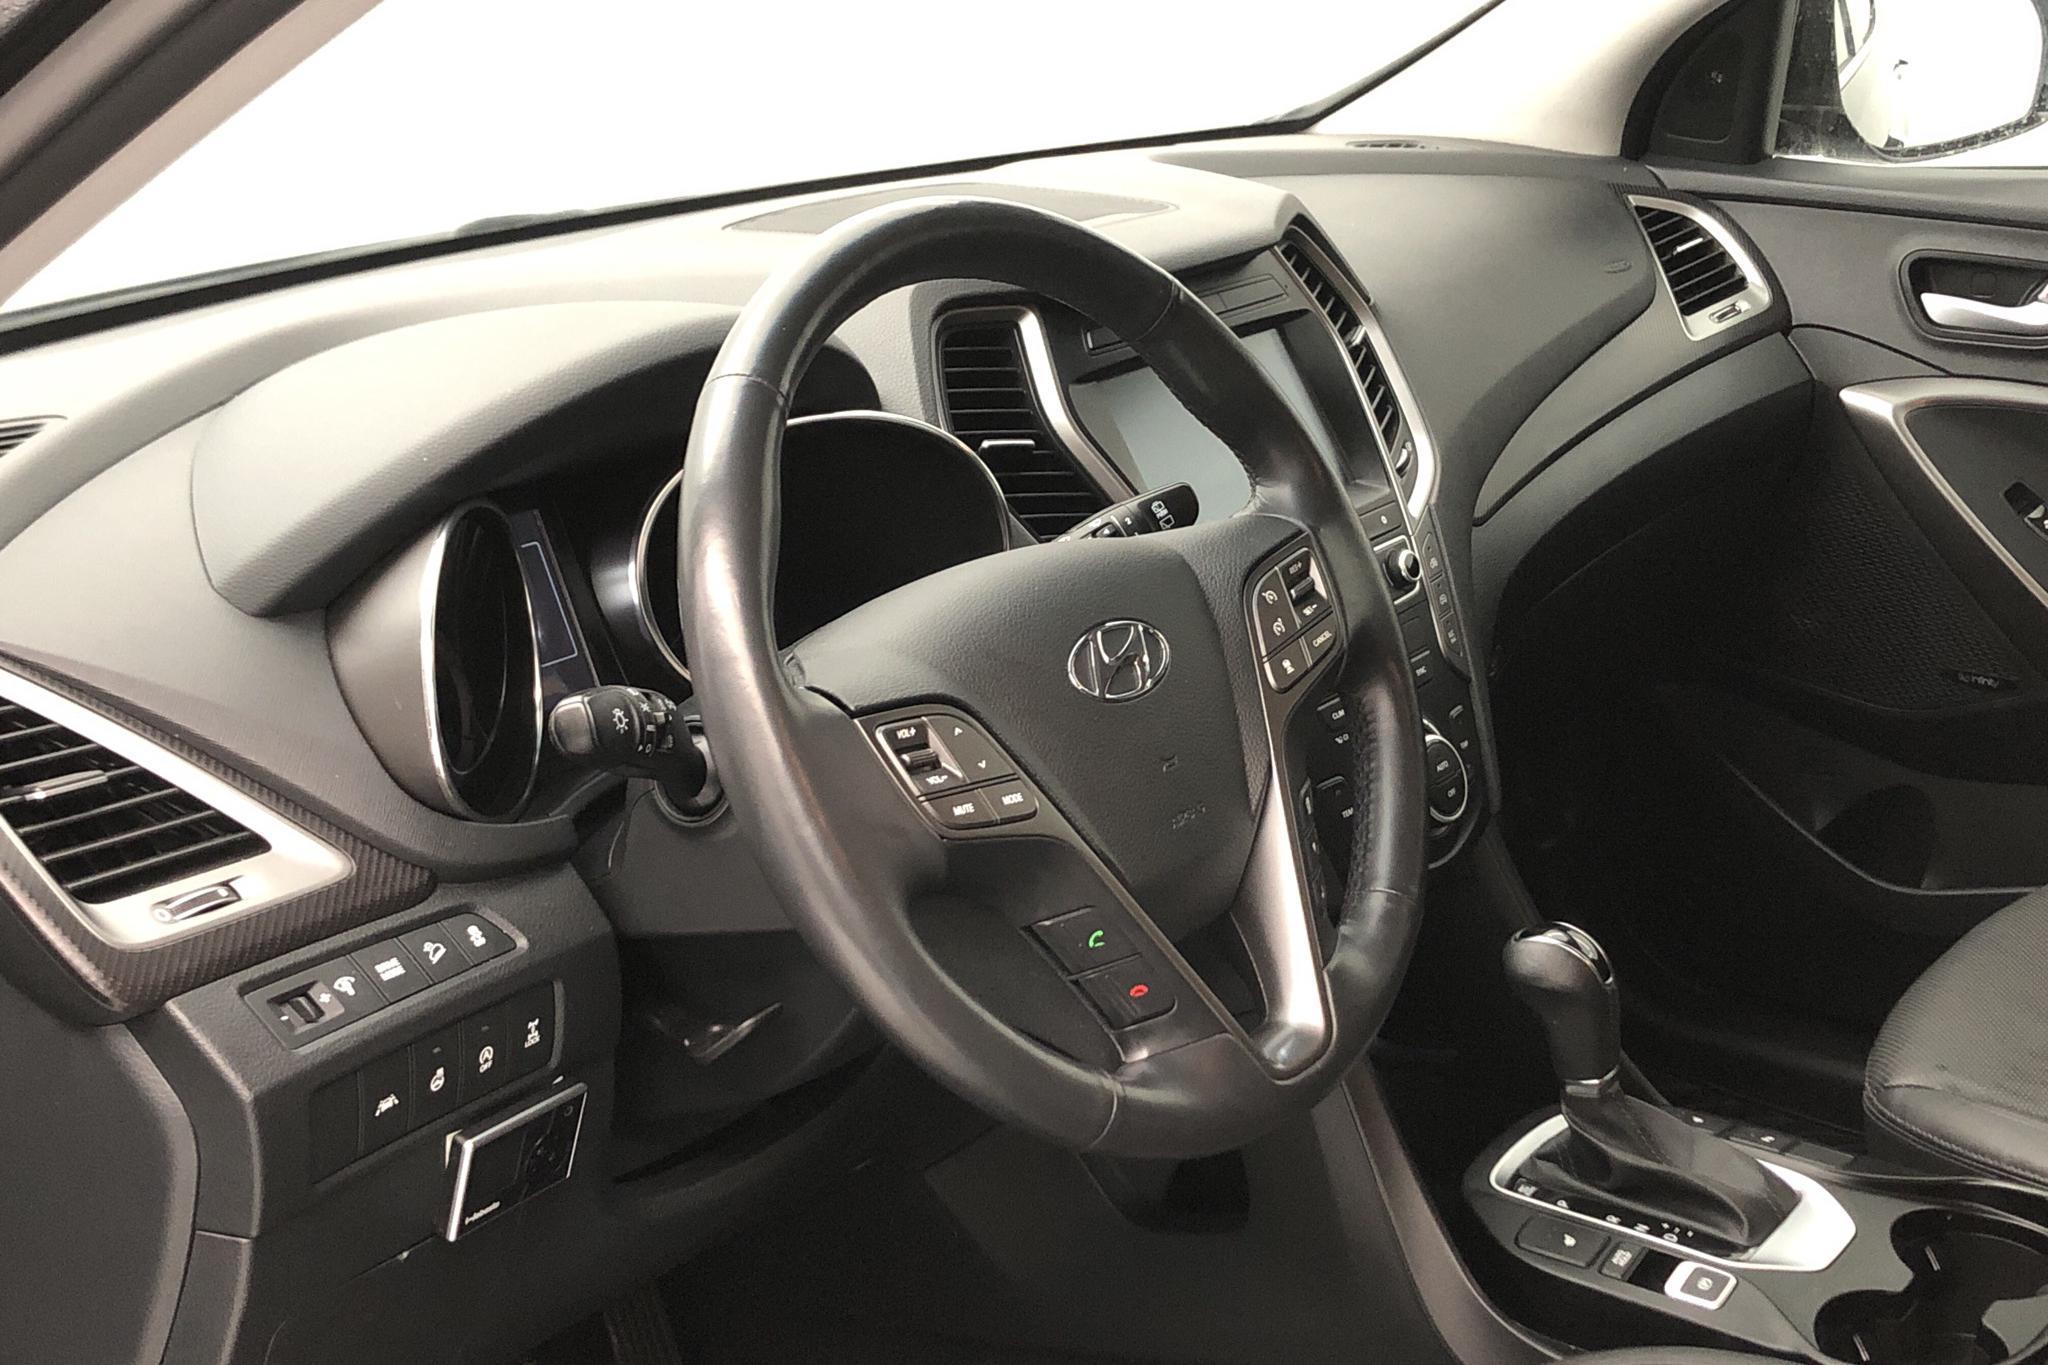 Hyundai Santa Fé 2.2 D 4WD (200hk) - 5 270 mil - Automat - svart - 2016